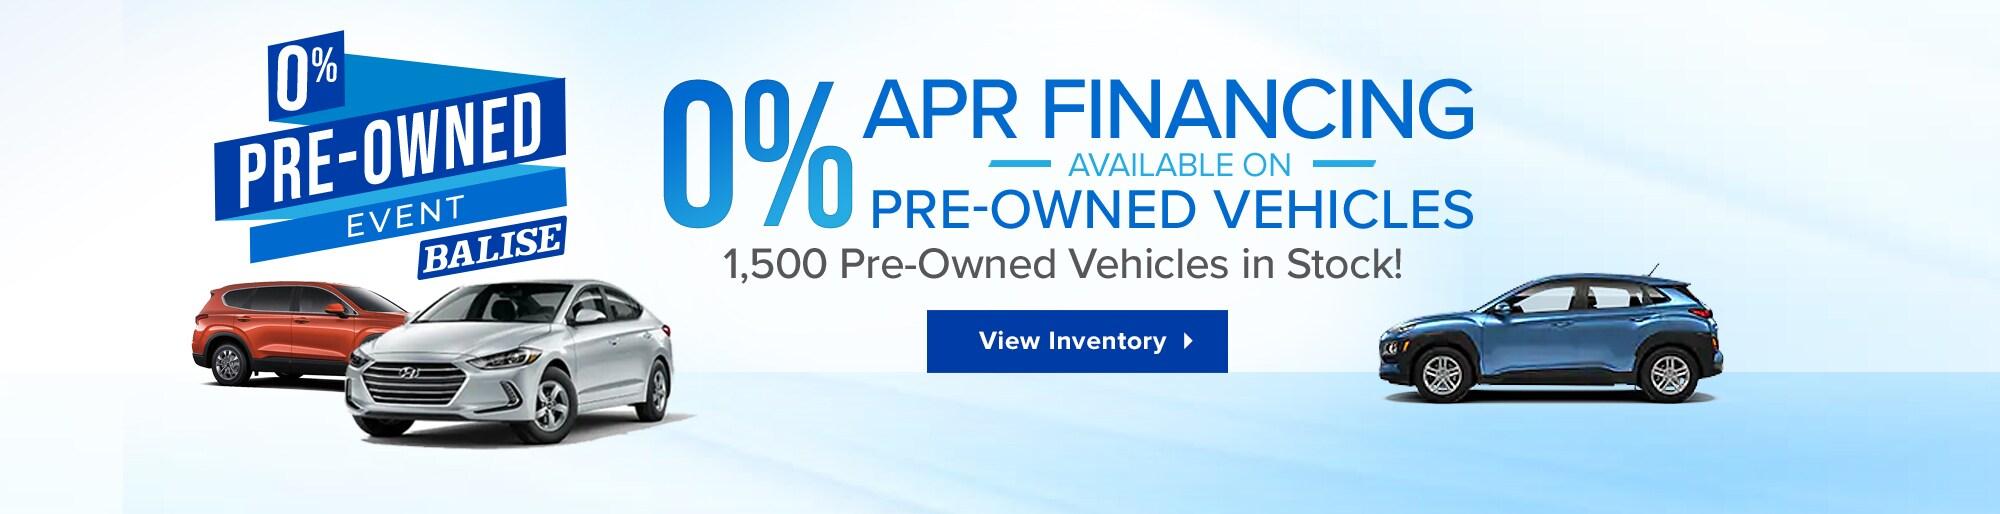 Balise Hyundai Of Cape Cod New Car Dealer Hyannis Ma